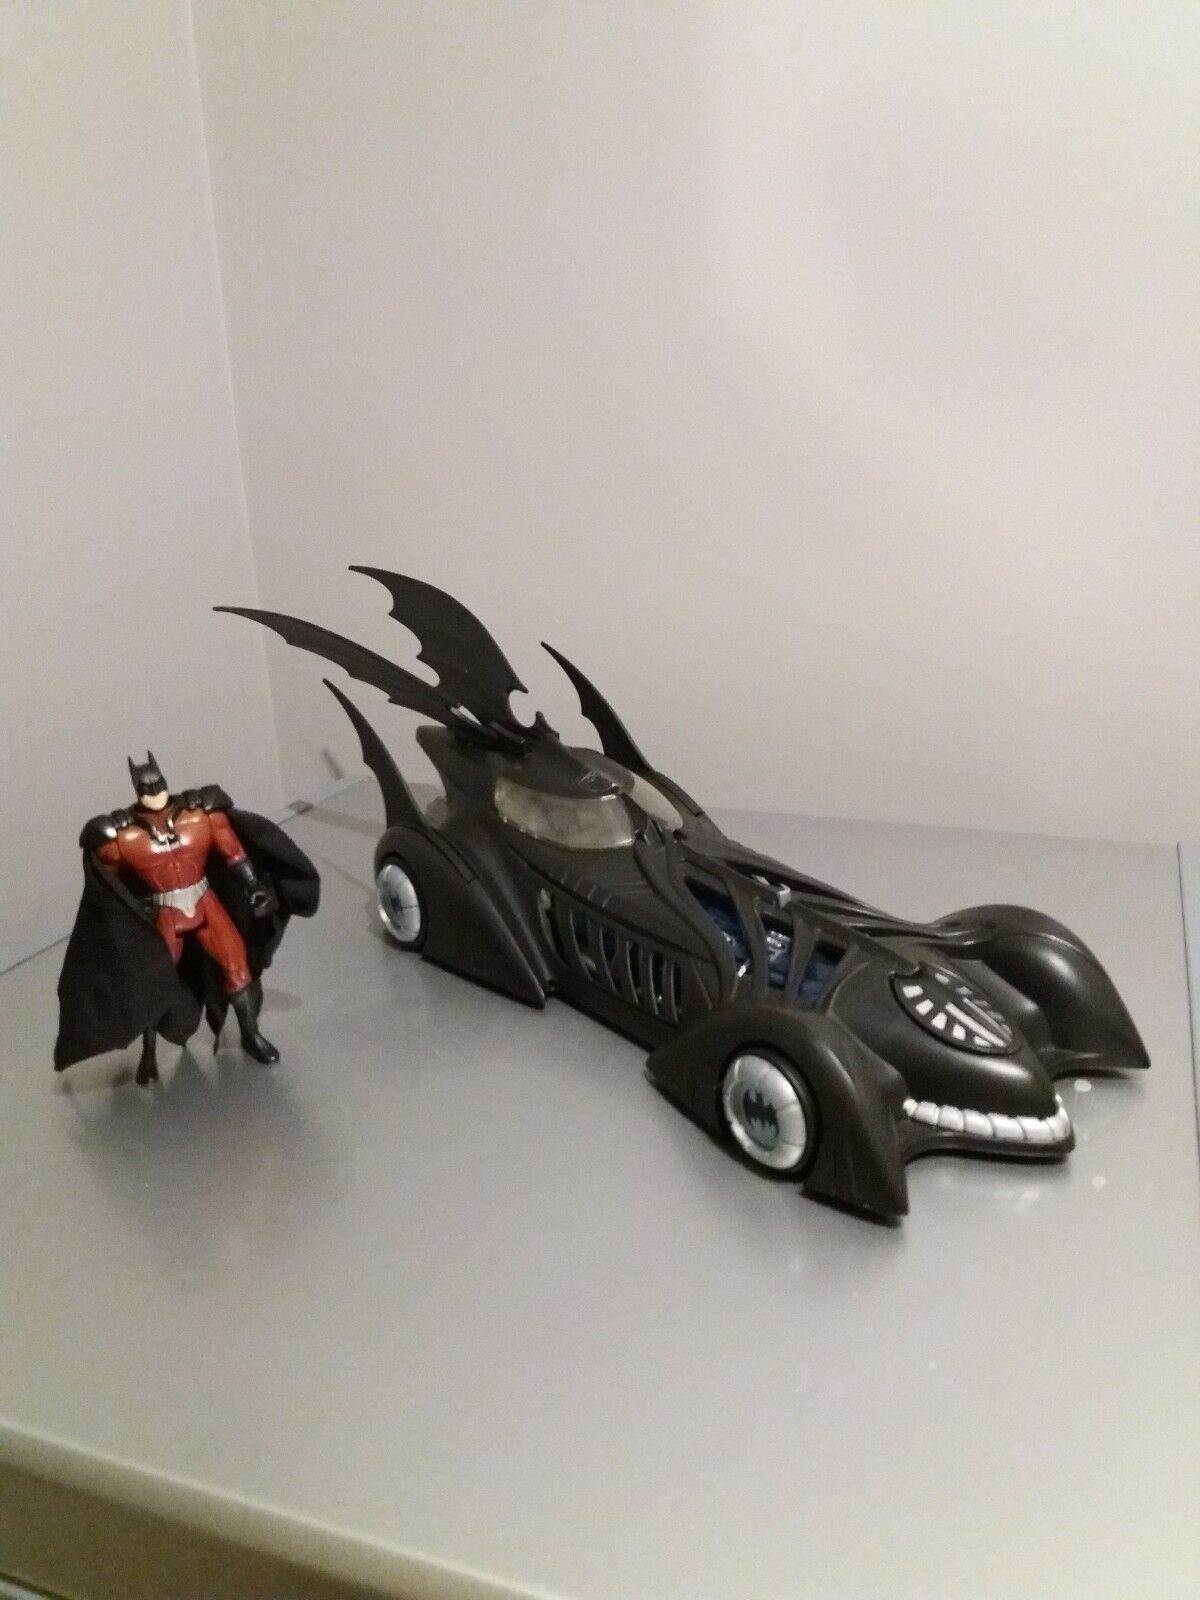 Seltene batman forever - elektronische batmobil fahrzeug fireguard batman abbildung 1995